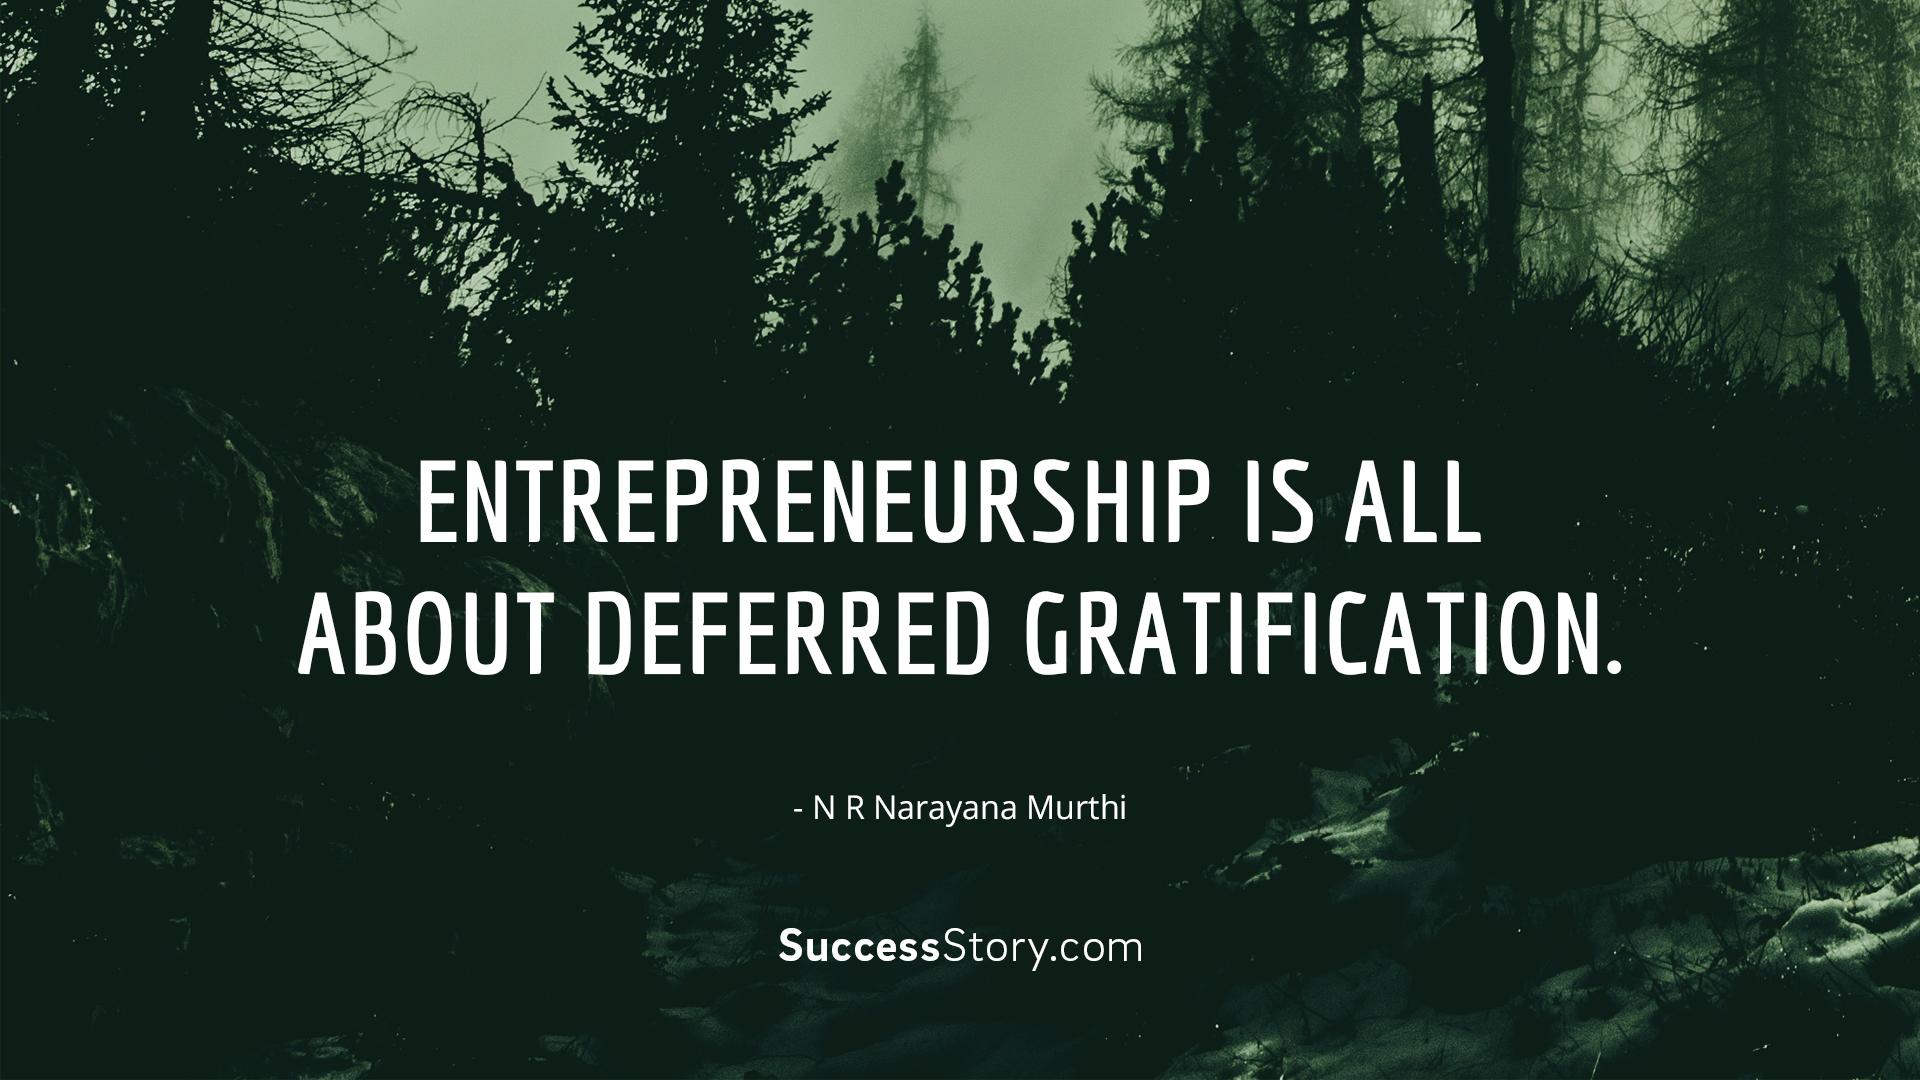 Entrepreneurship is all about deferred gratification